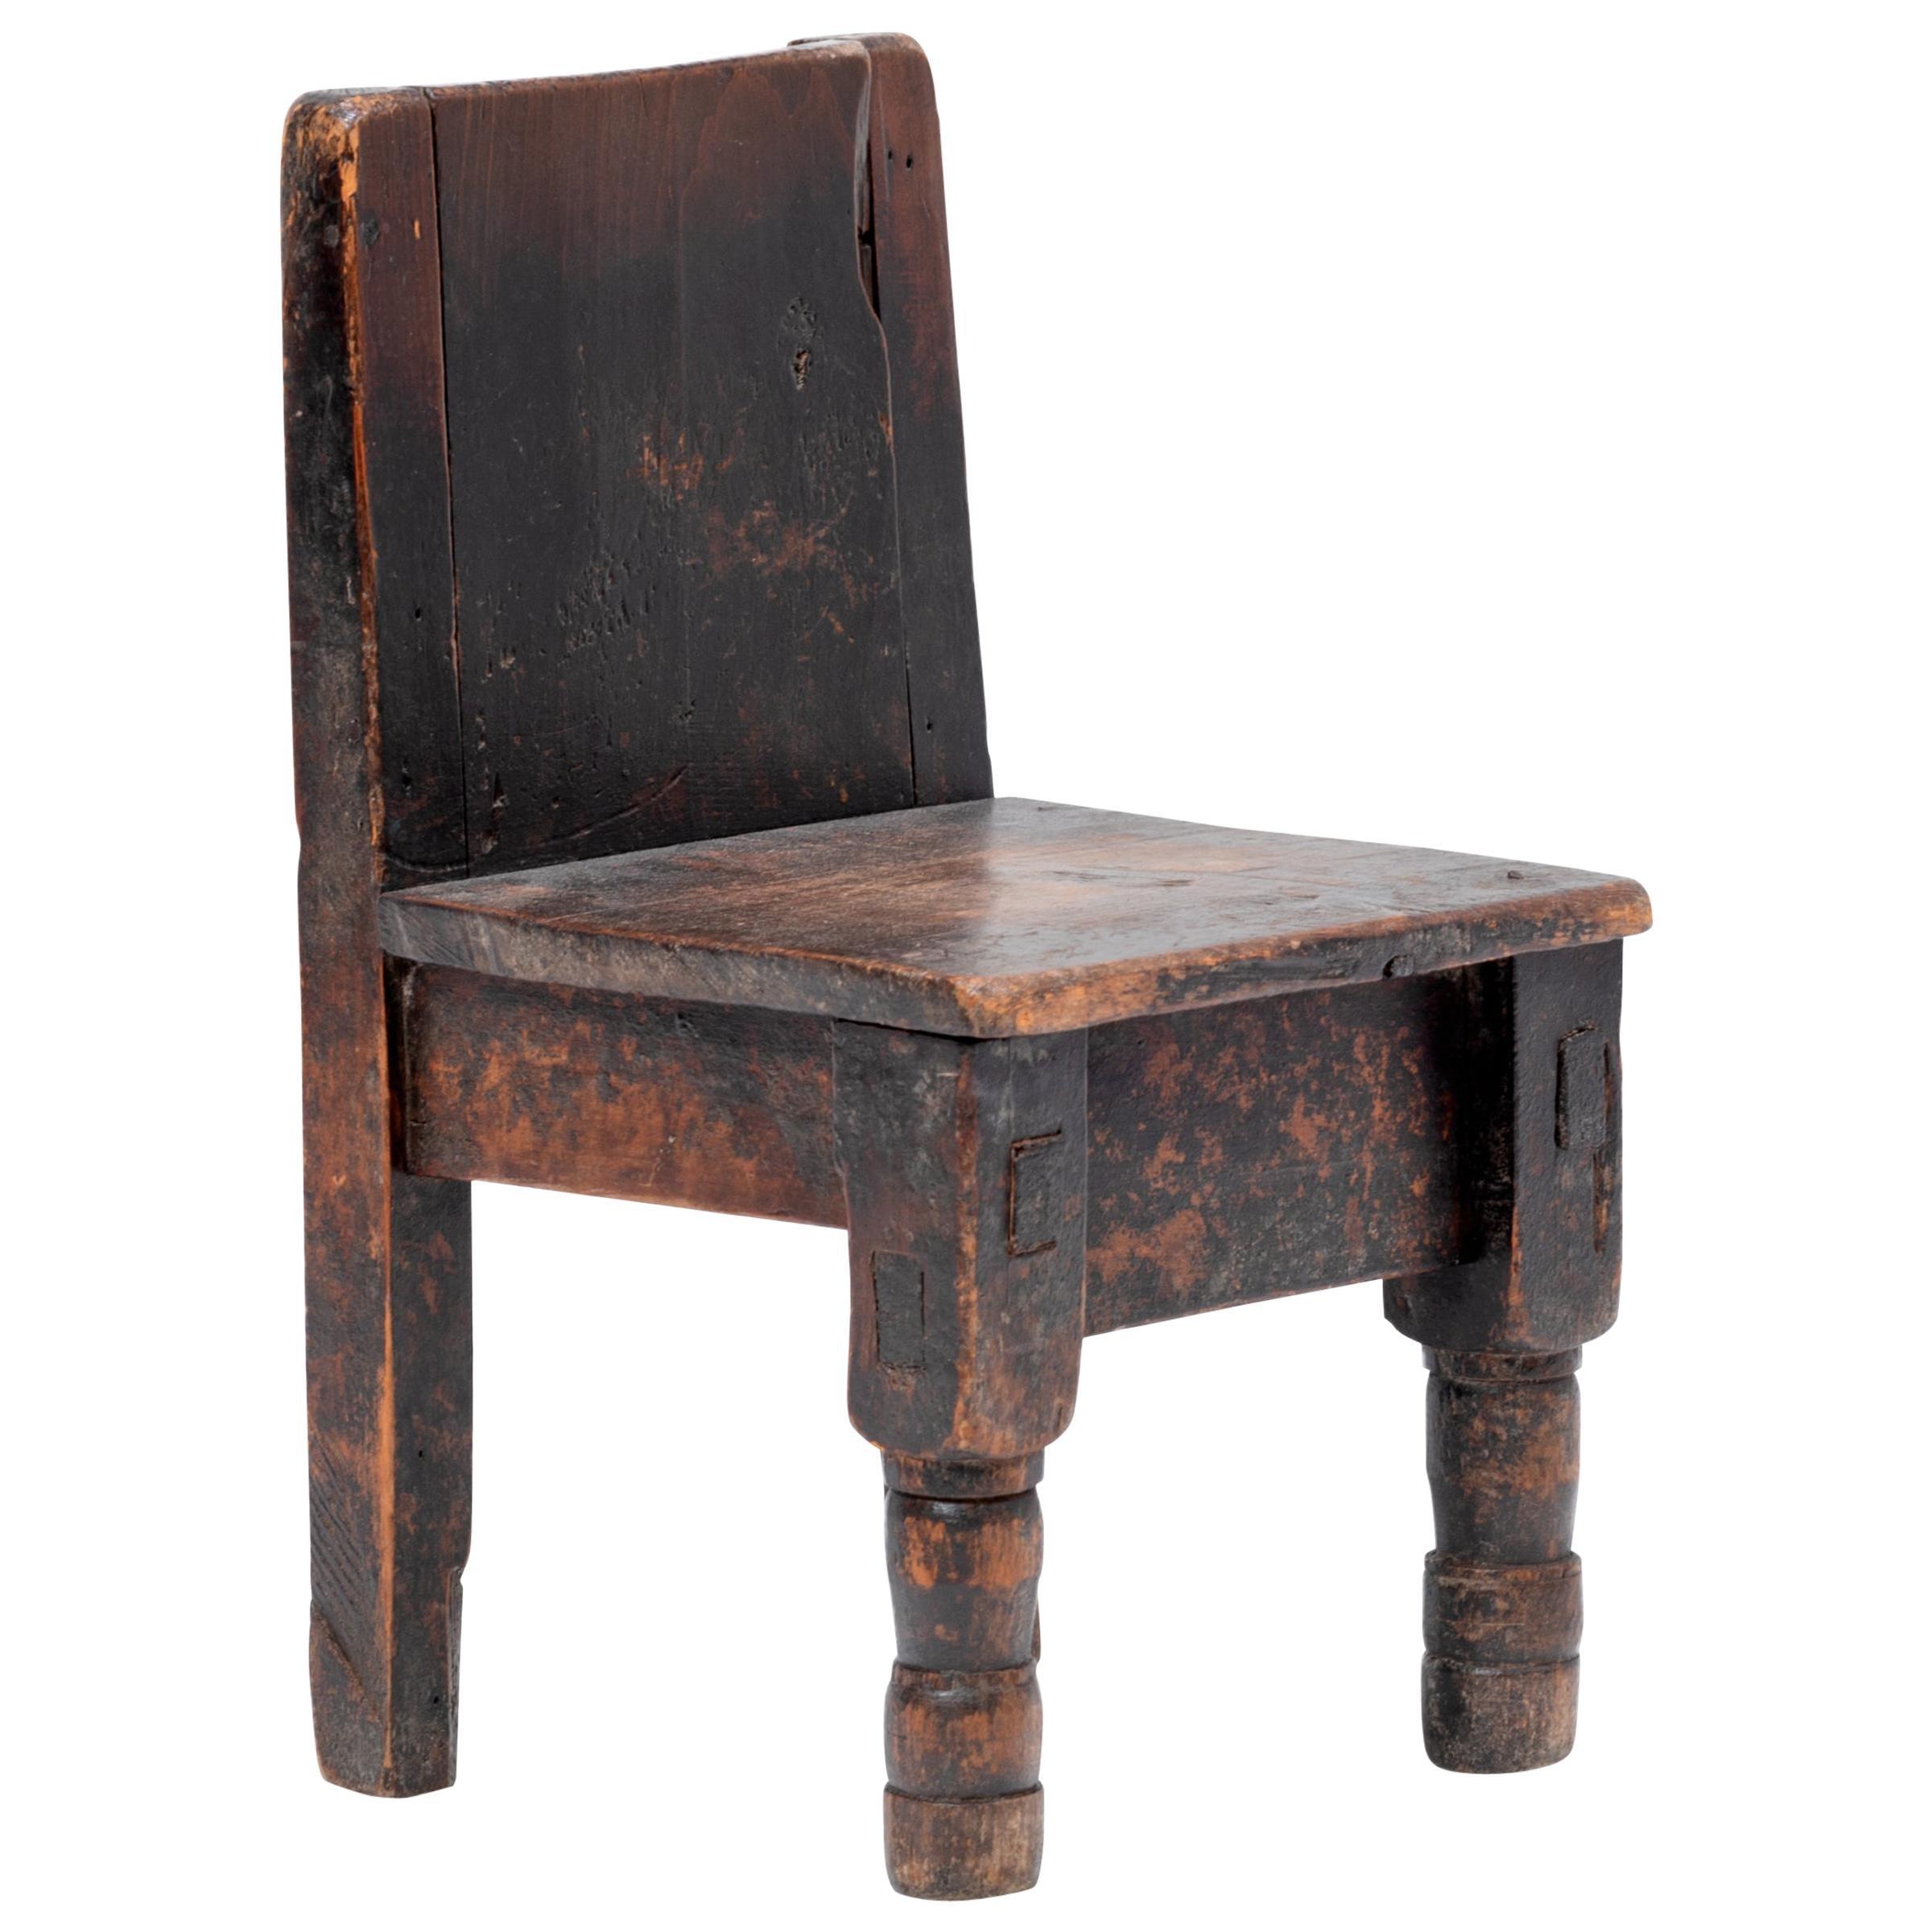 Guatemalan Child's Chair, circa 1900